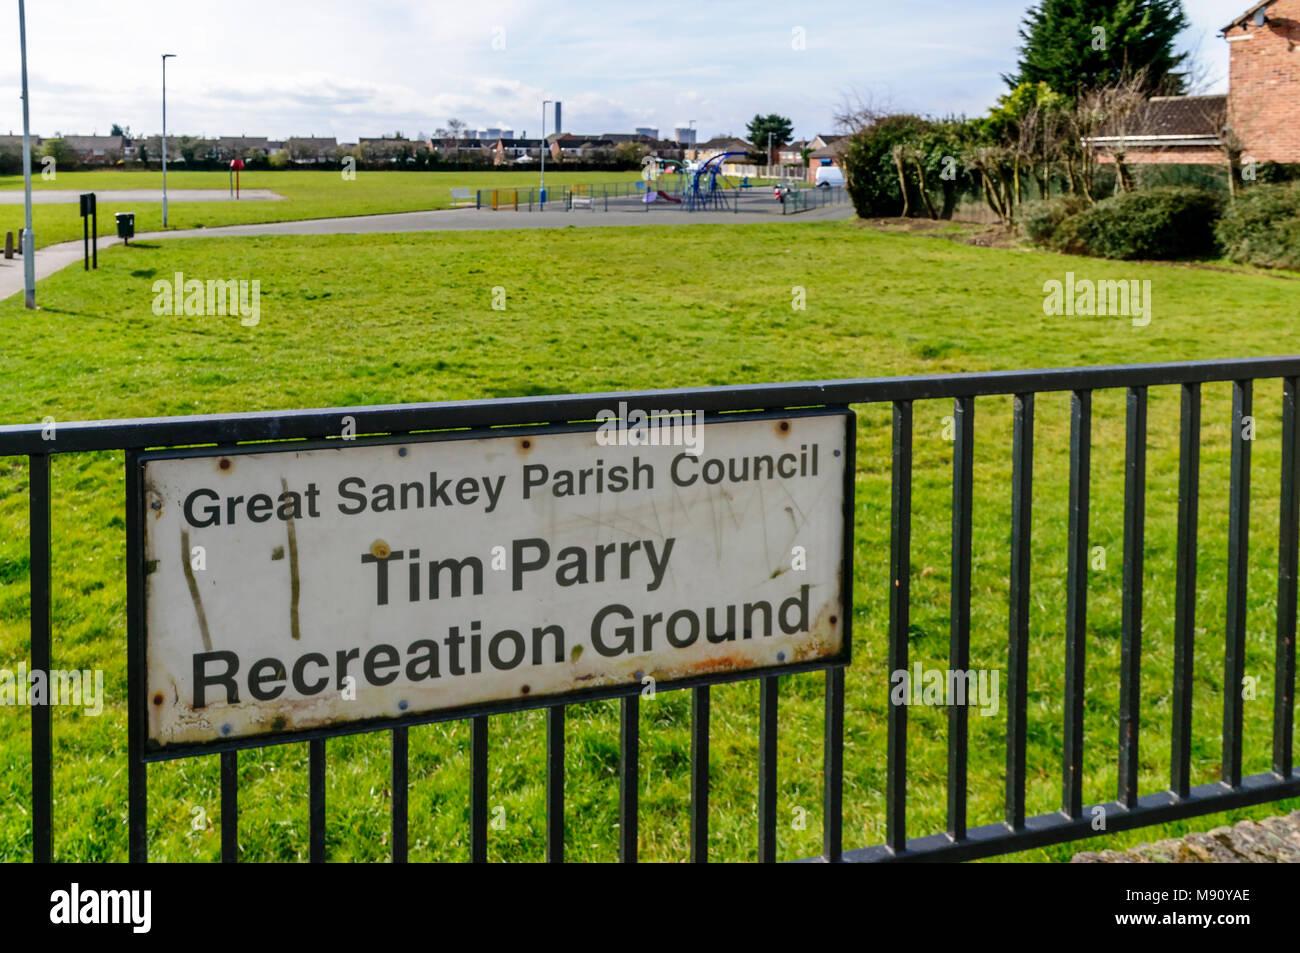 Tim Parry memorial Recreation Ground Great Sankey. - Stock Image